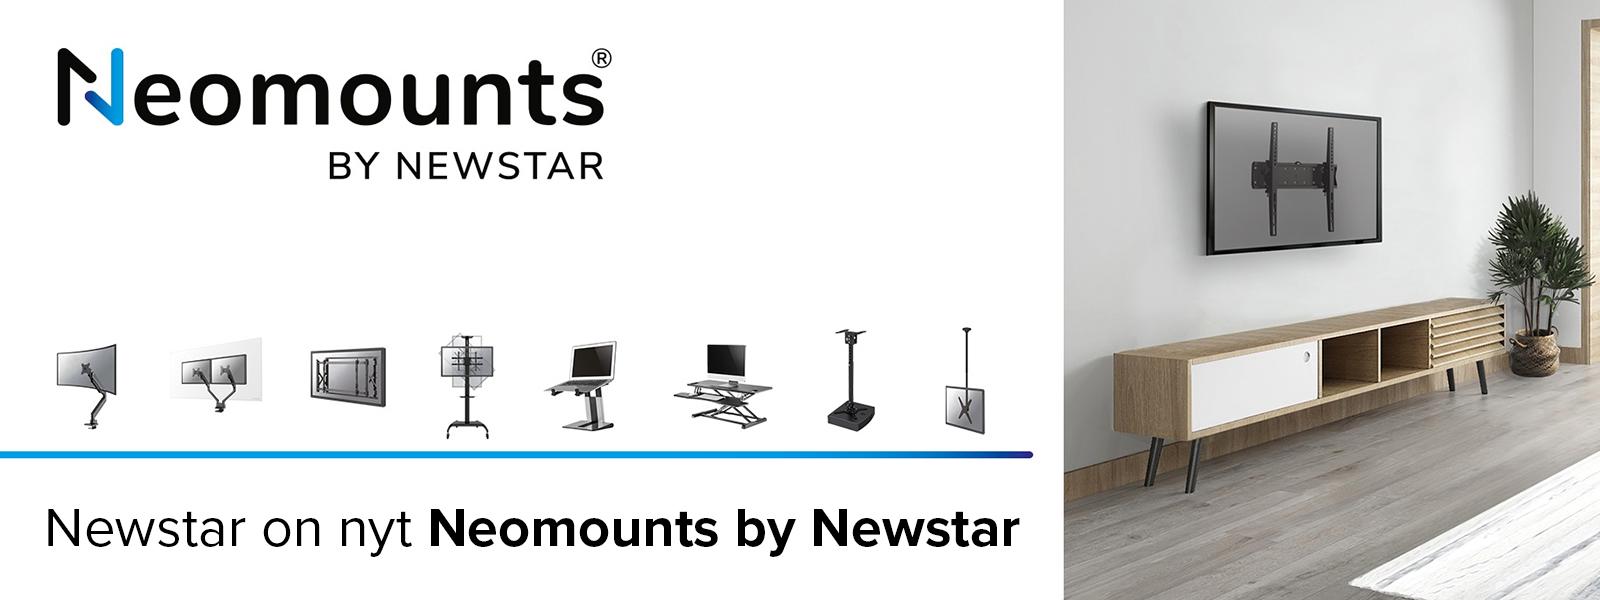 newstar_neomounts_header